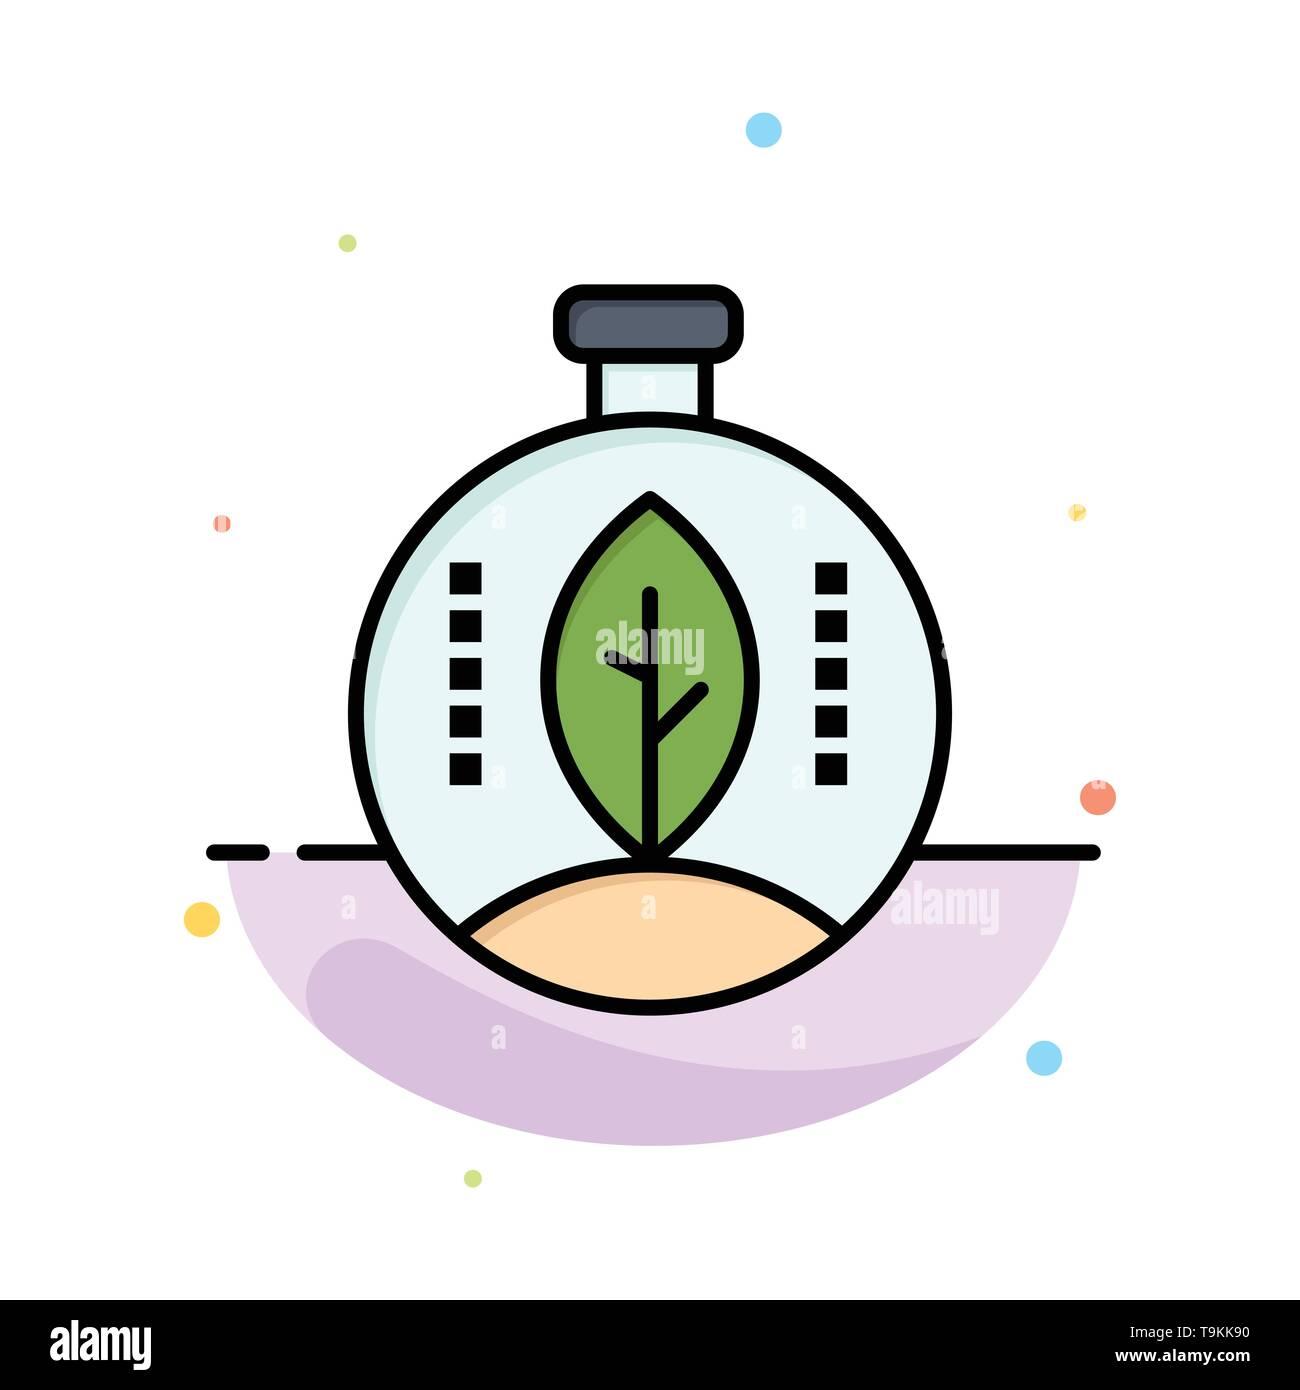 Grün, Innovation, Energie, Power Abstrakte flachen Farbe Symbol Vorlage Stockbild